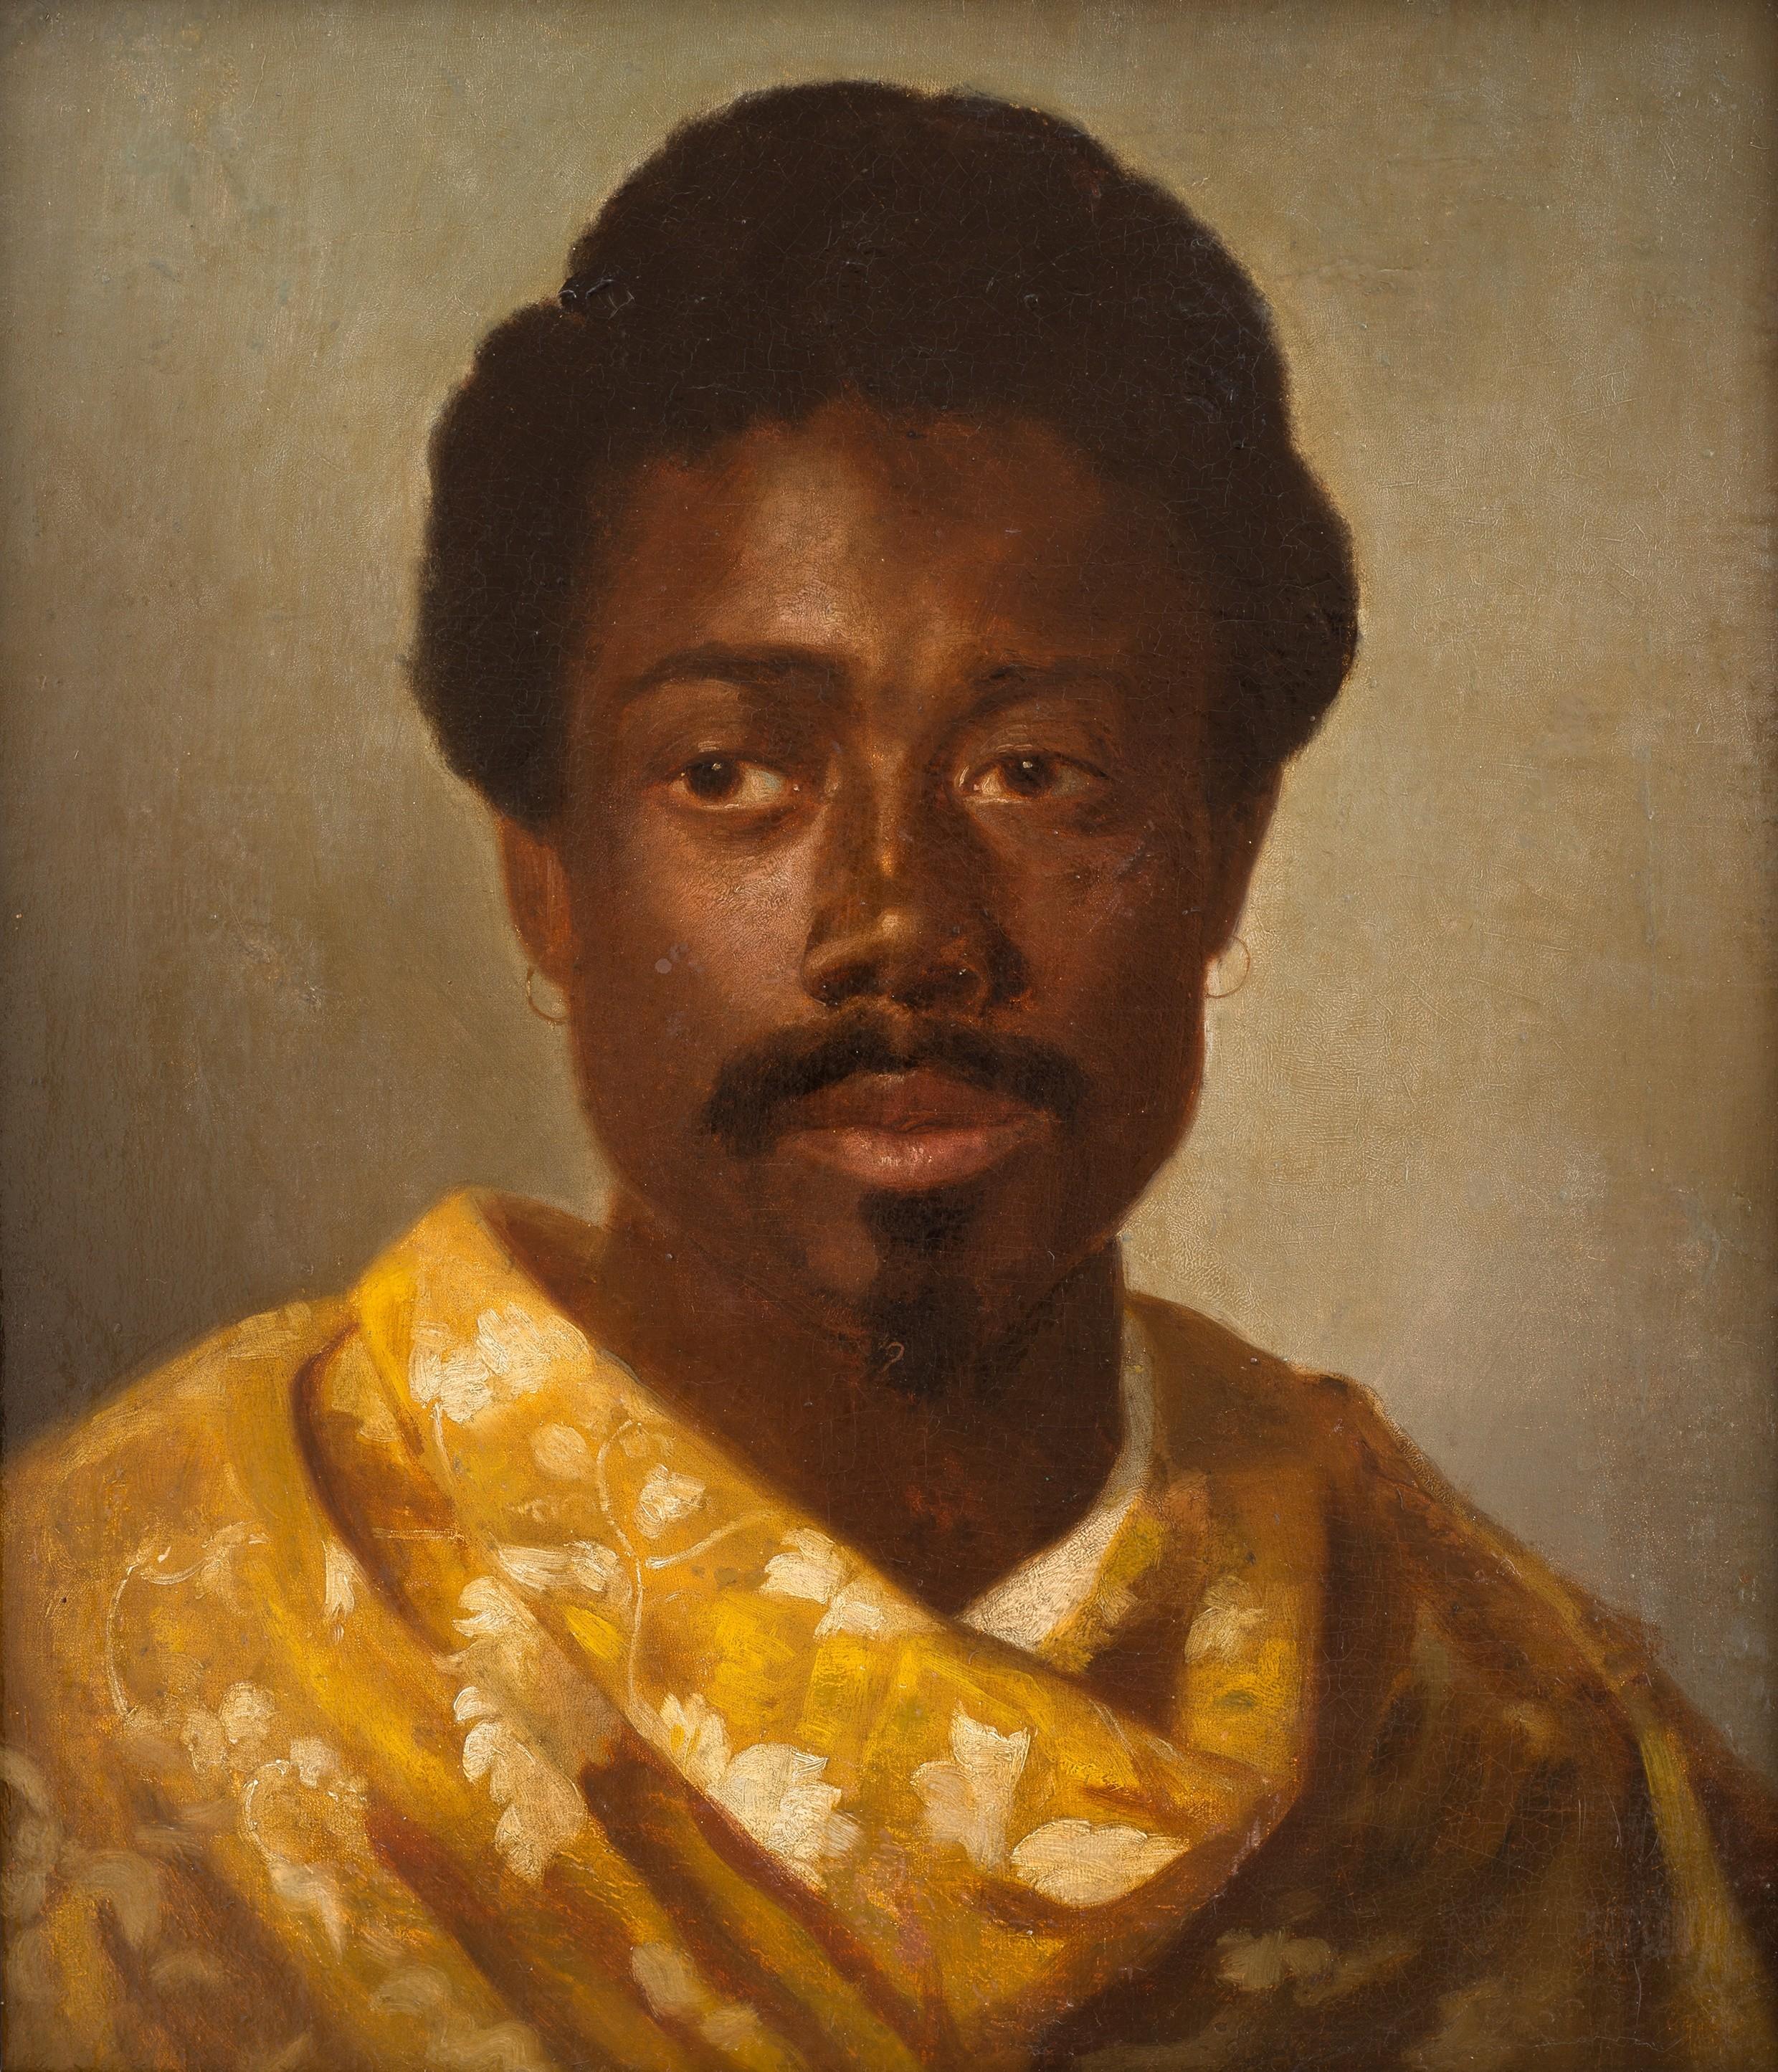 Wilhelm Gentz: Portrait of Mohammed Farady, oil painting, 1889 ((Theodor-Fontane-Archiv, Foto: Ronka Oberhammer/Lorenz Kienzle, CC BY-NC-SA))